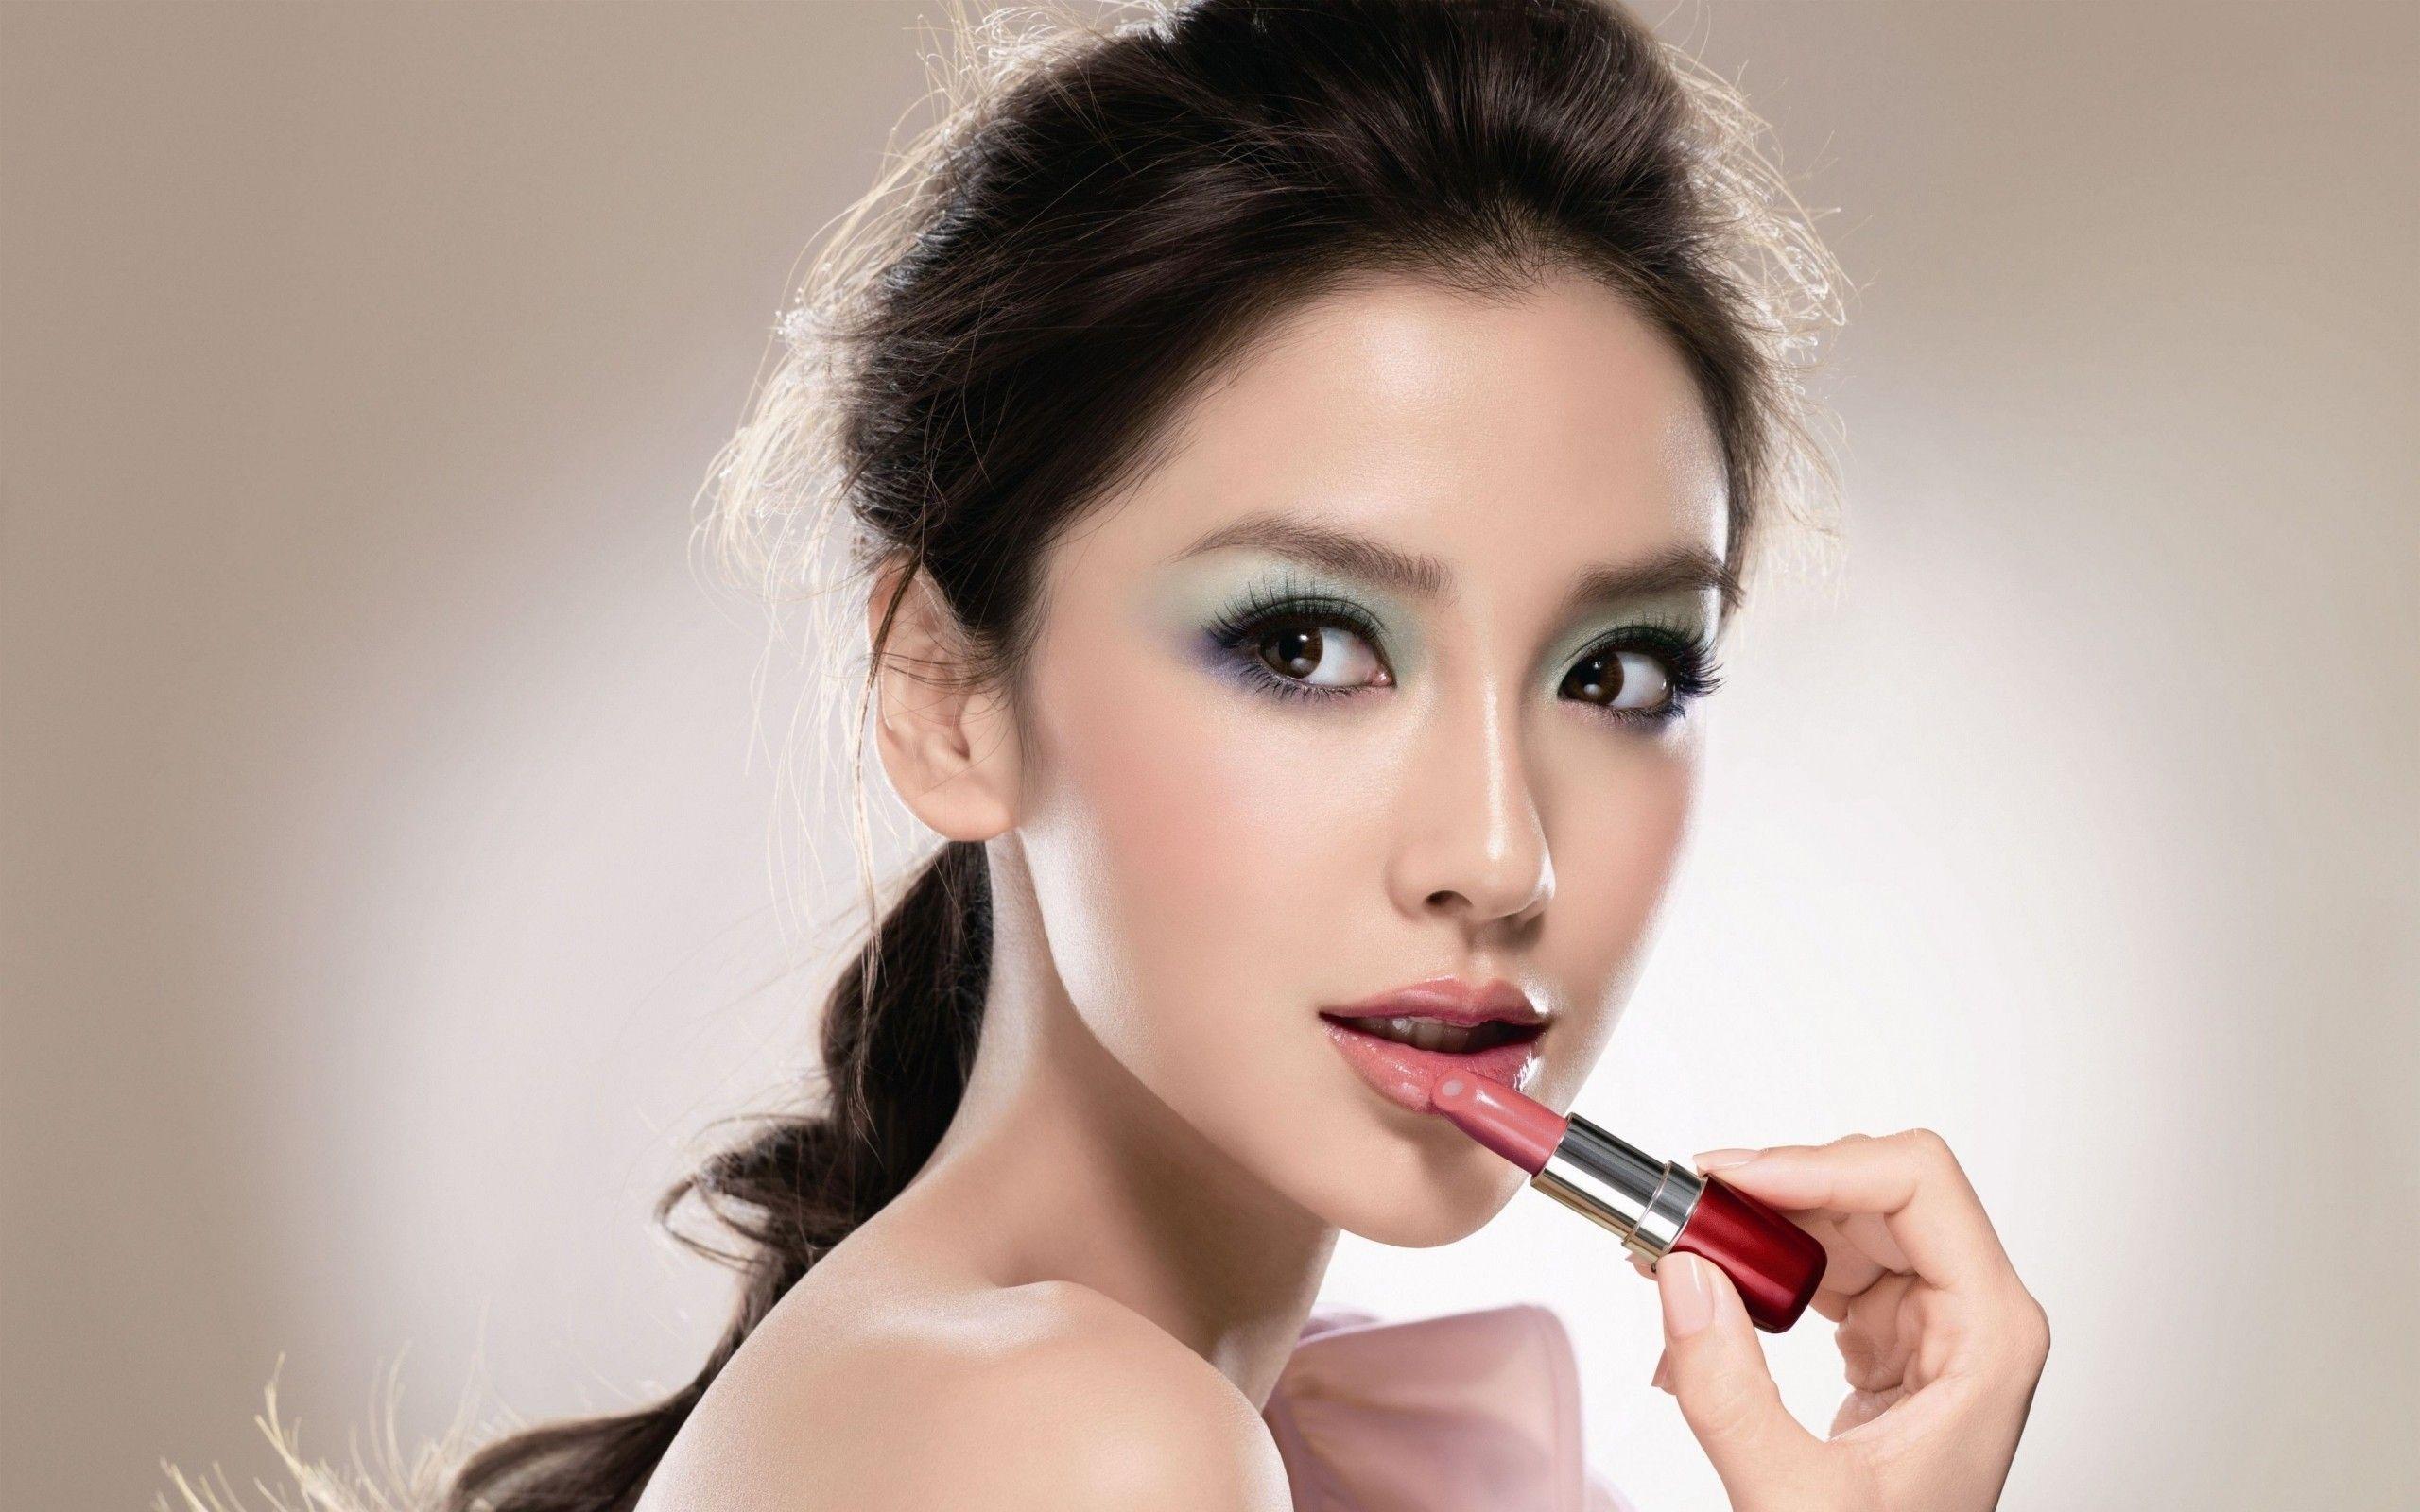 Japanese Girl Lipstick photos